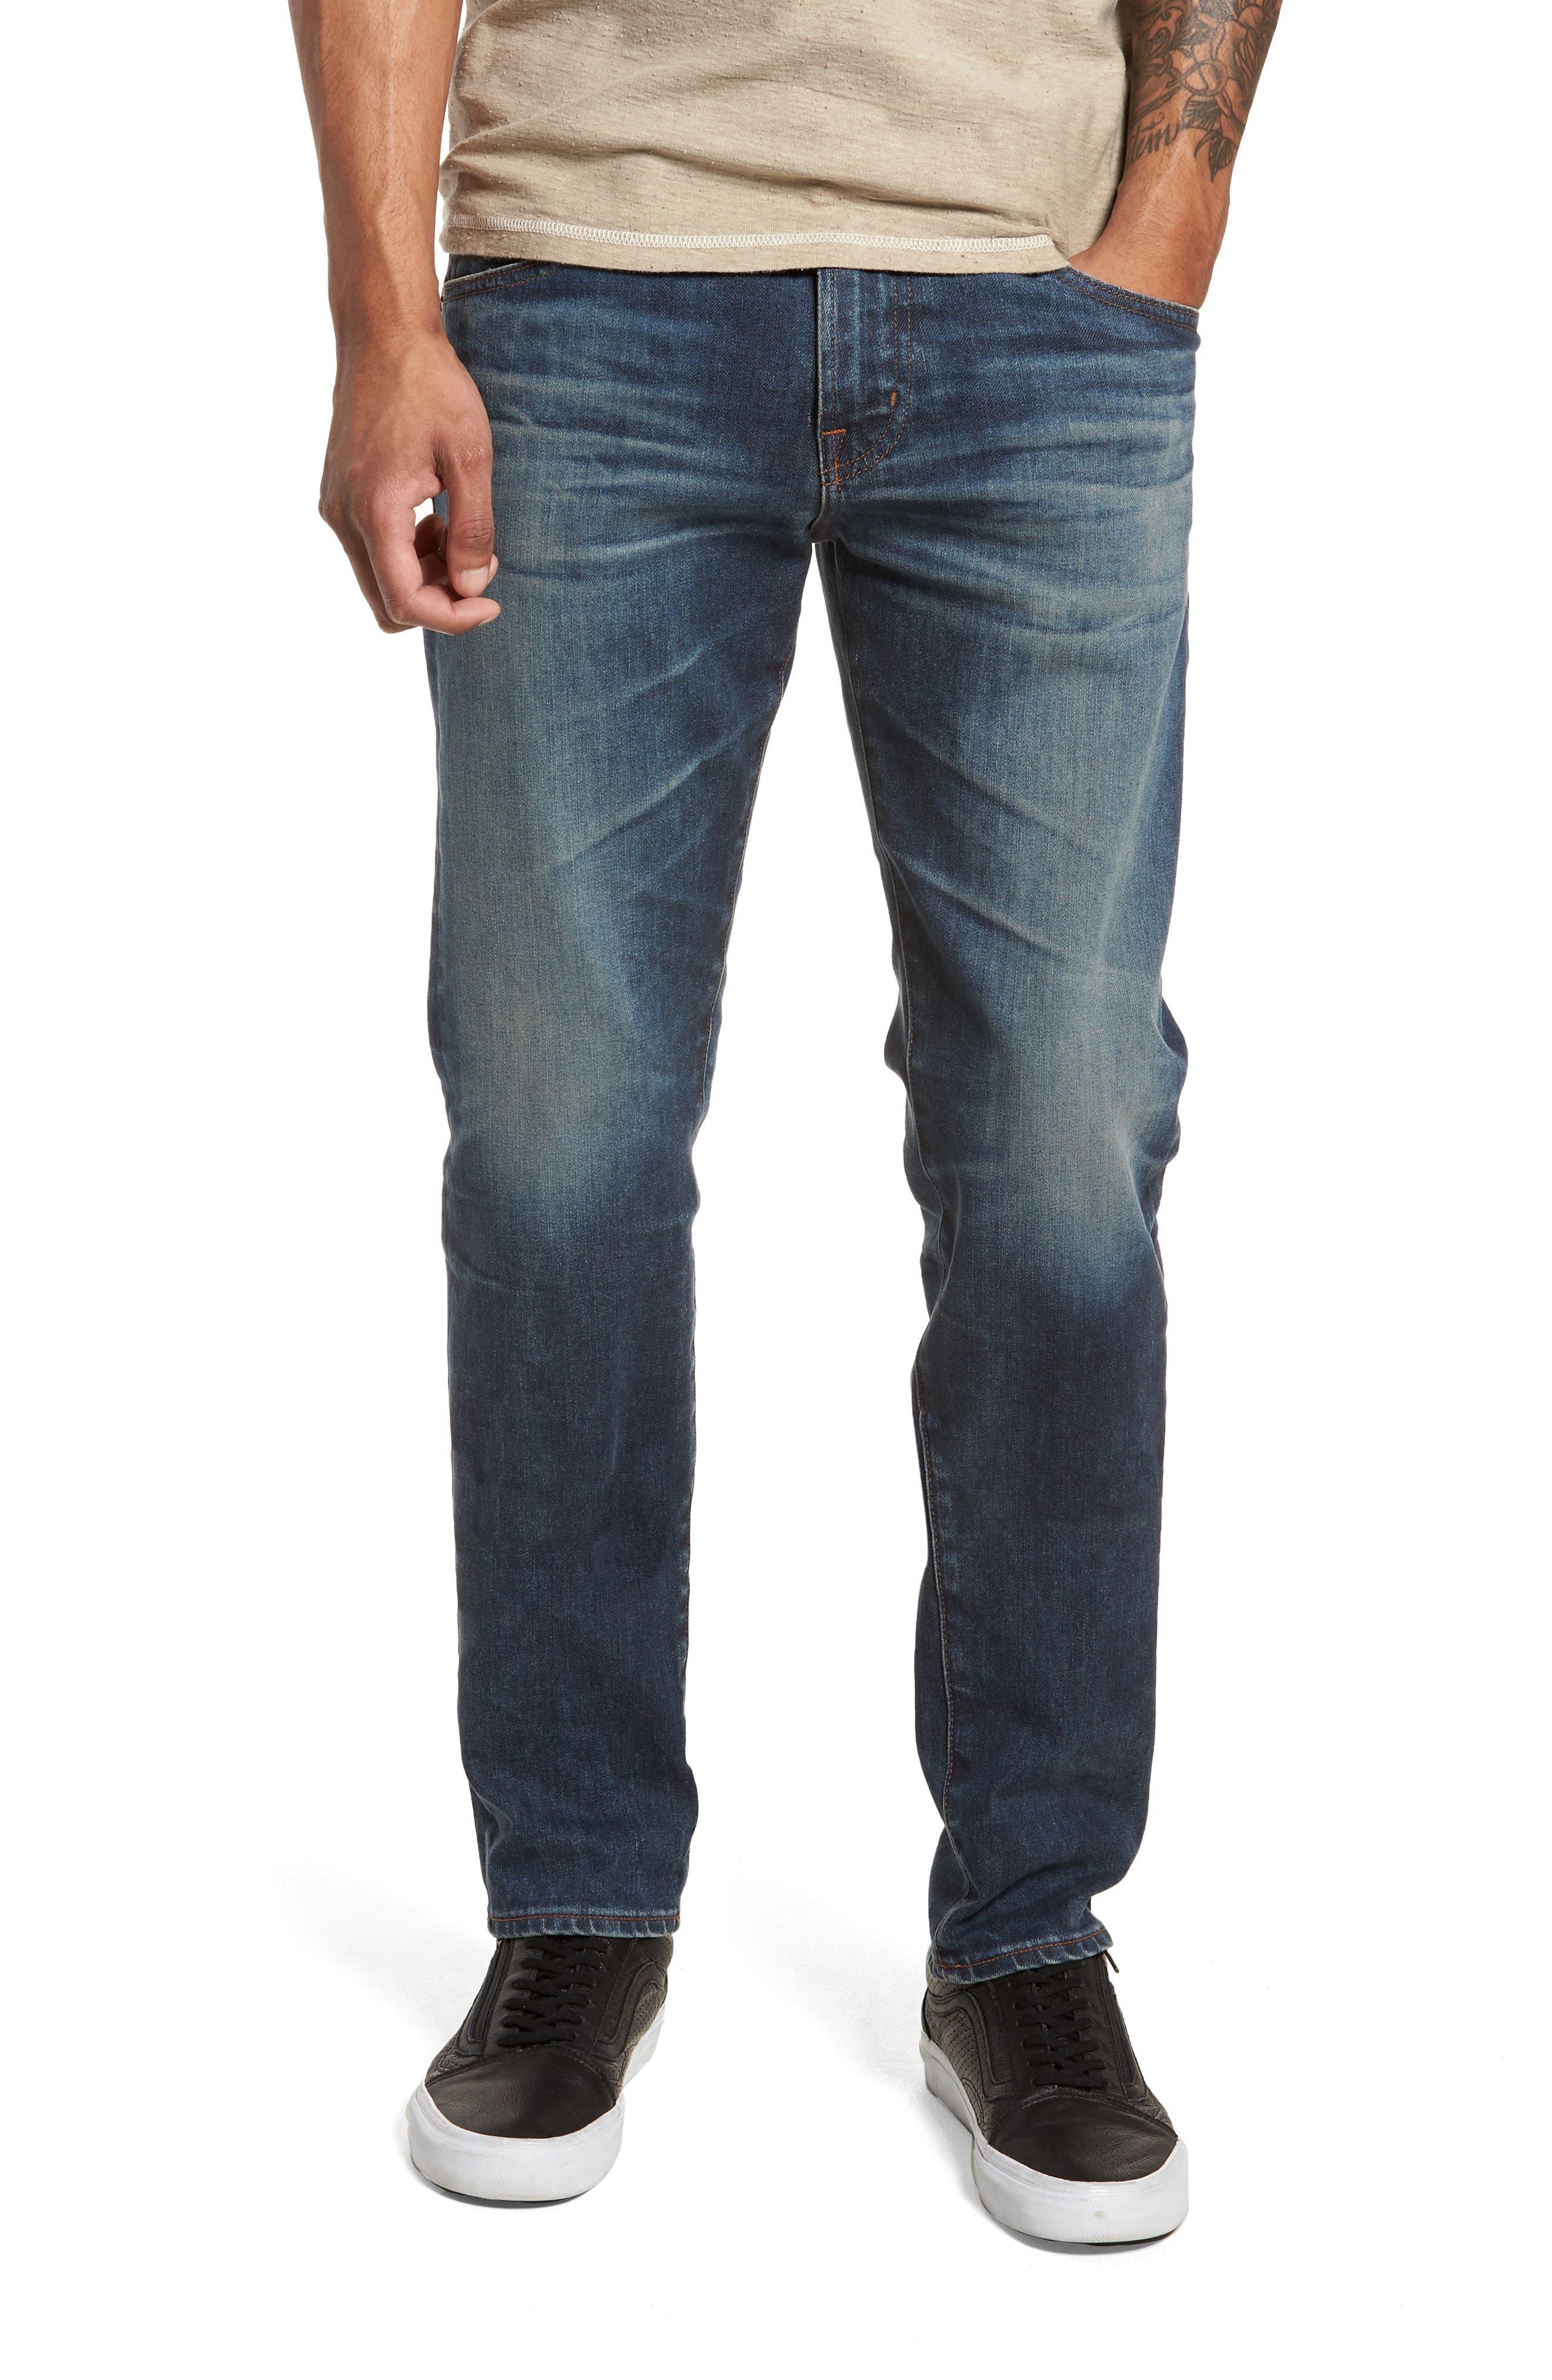 Dylan Slim Skinny Fit Jeans,                             Main thumbnail 1, color,                             451